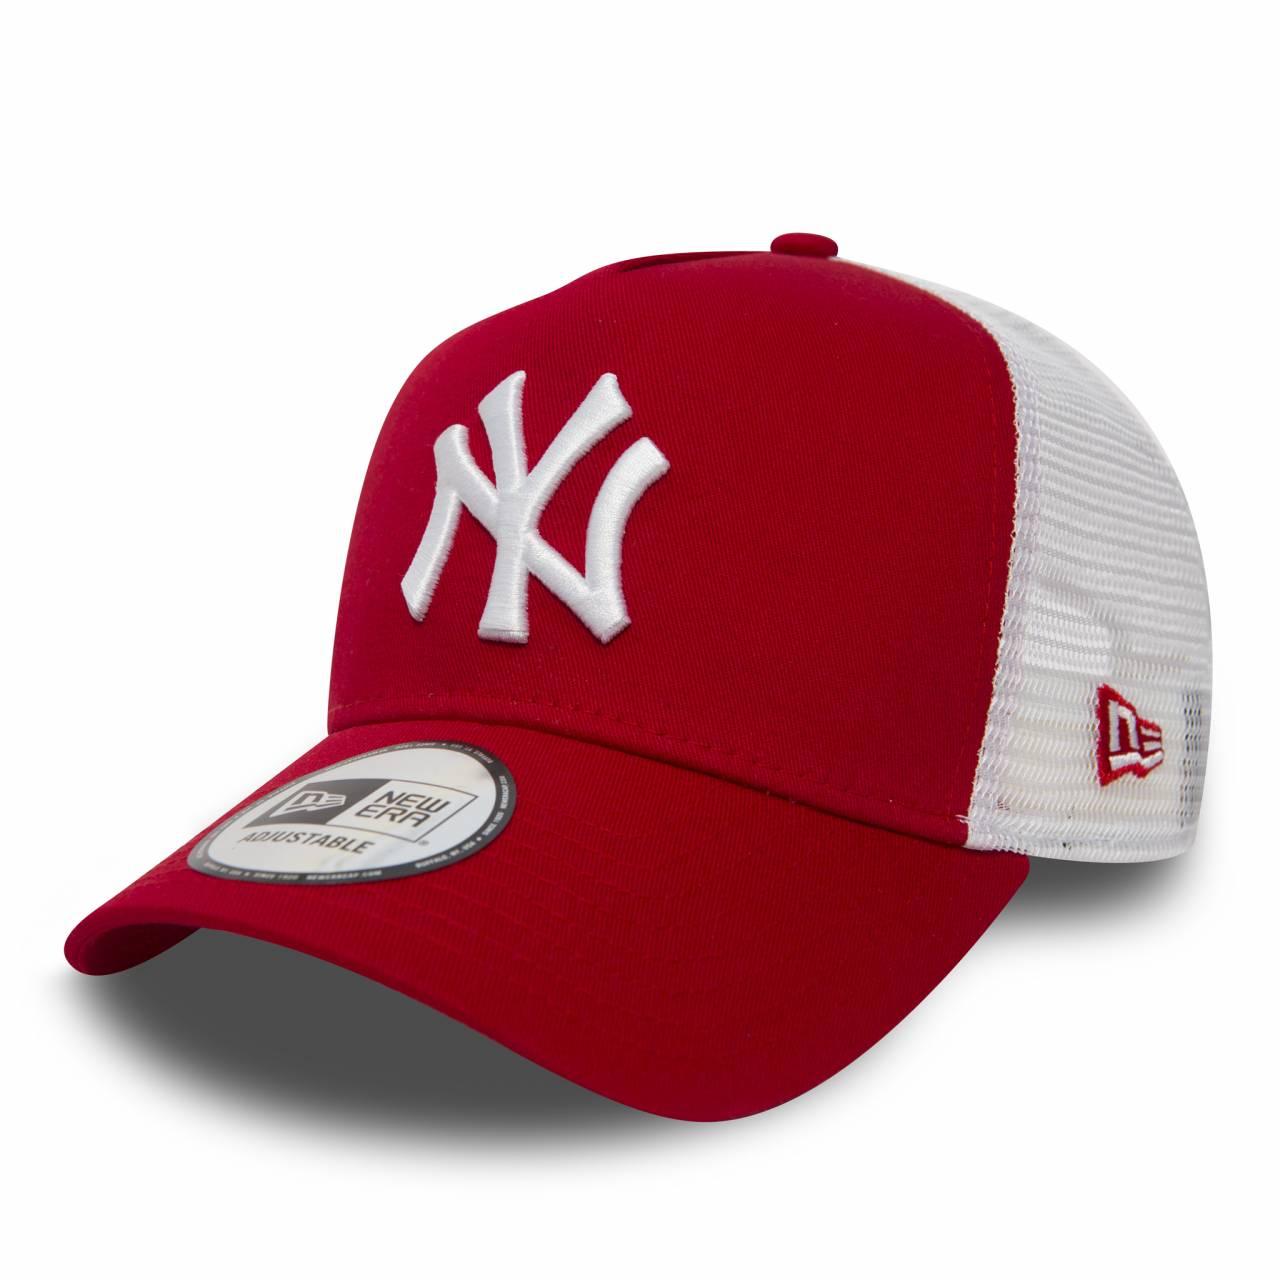 11588488 MLB TRUCKER NEW YORK YANKEES RED/WHITE CAP